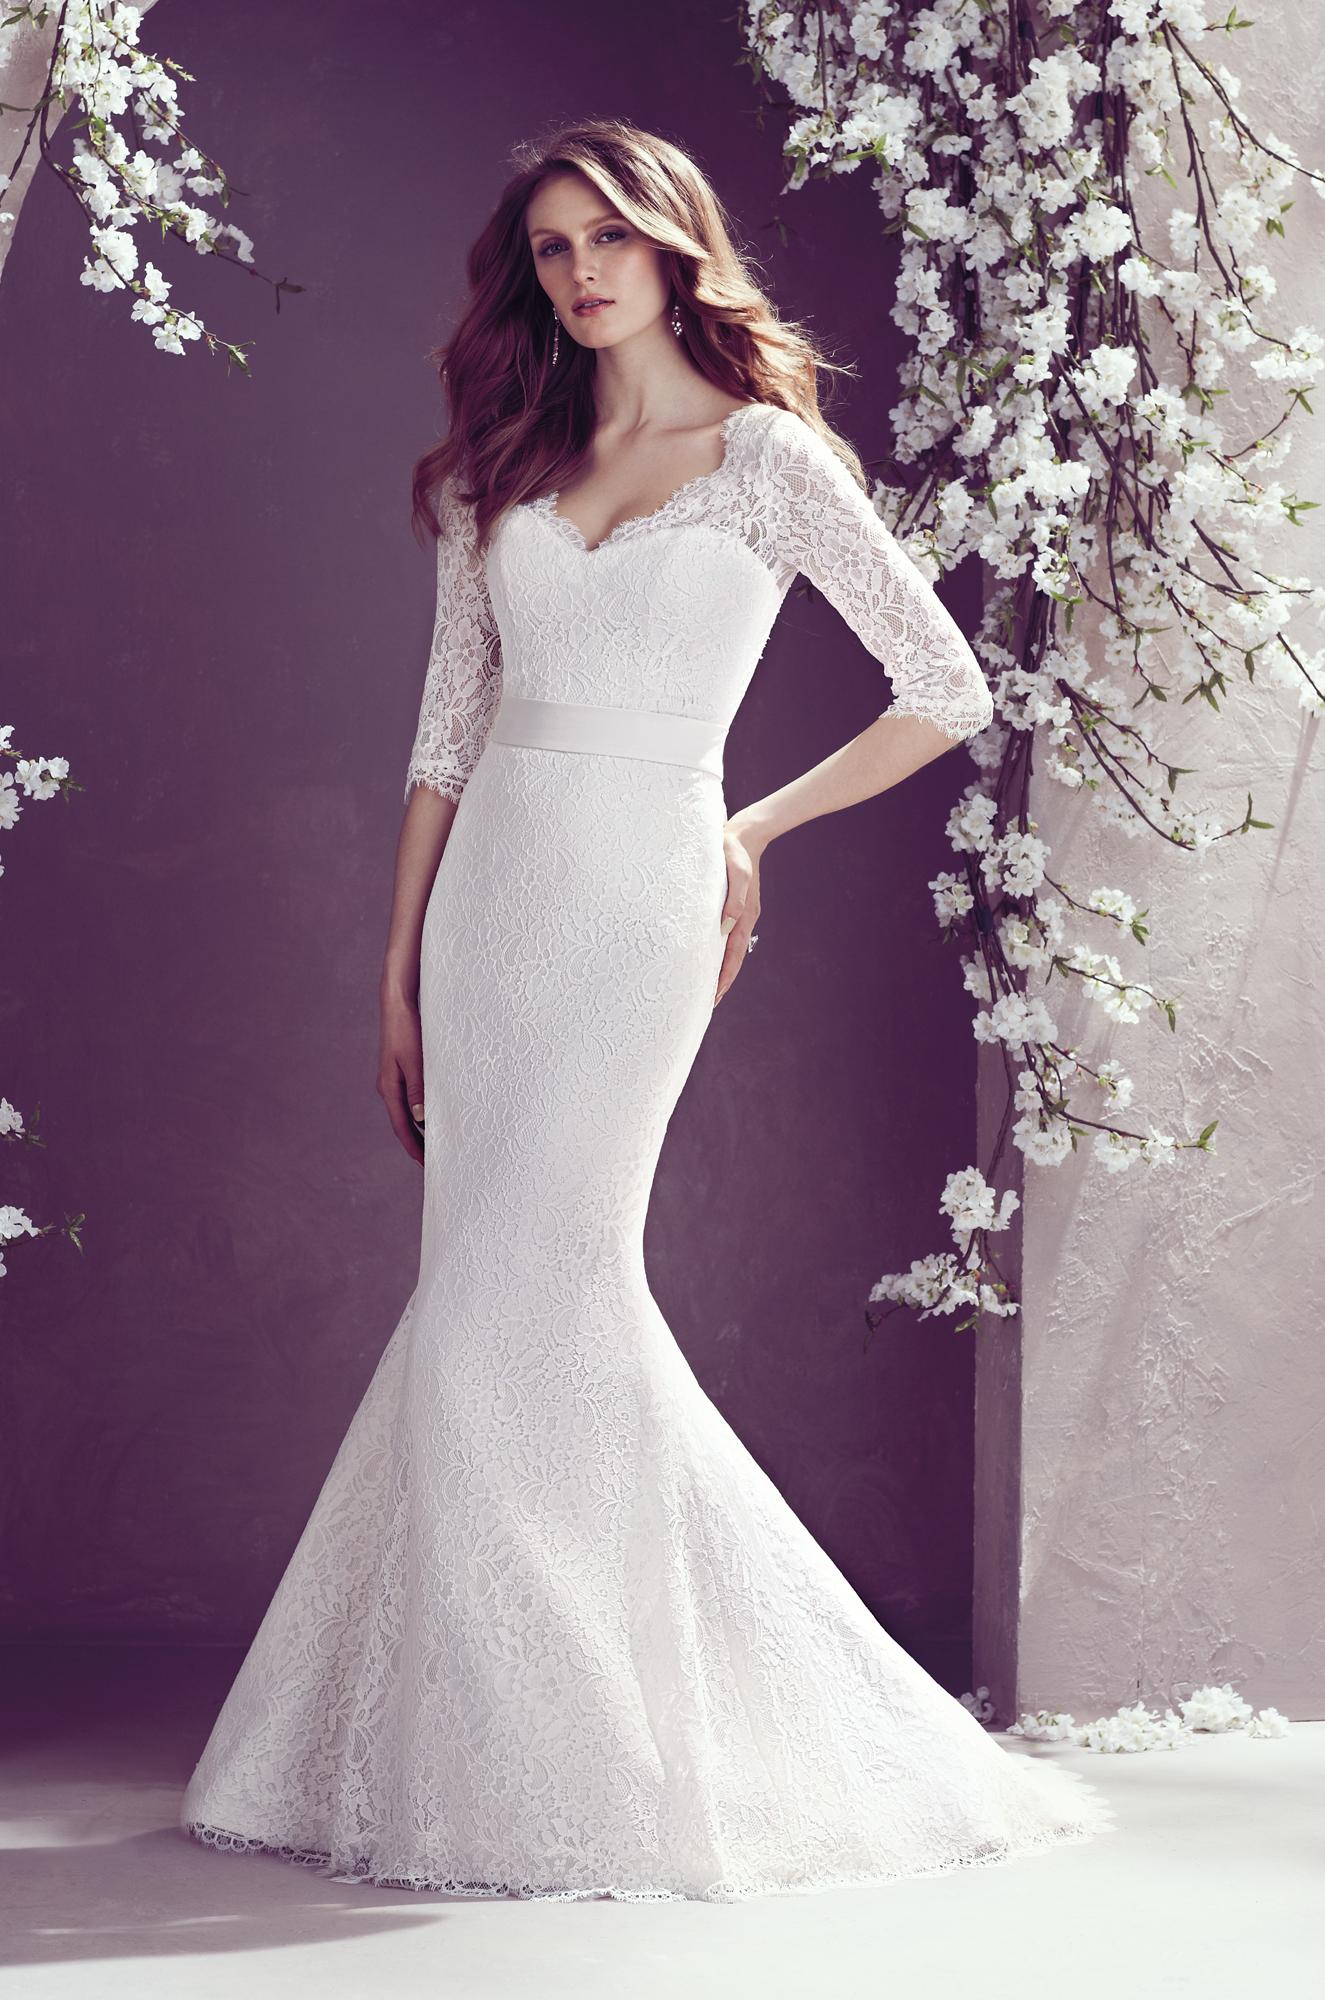 wedding dress wedding dresses | Weddings: Wedding Dresses ...